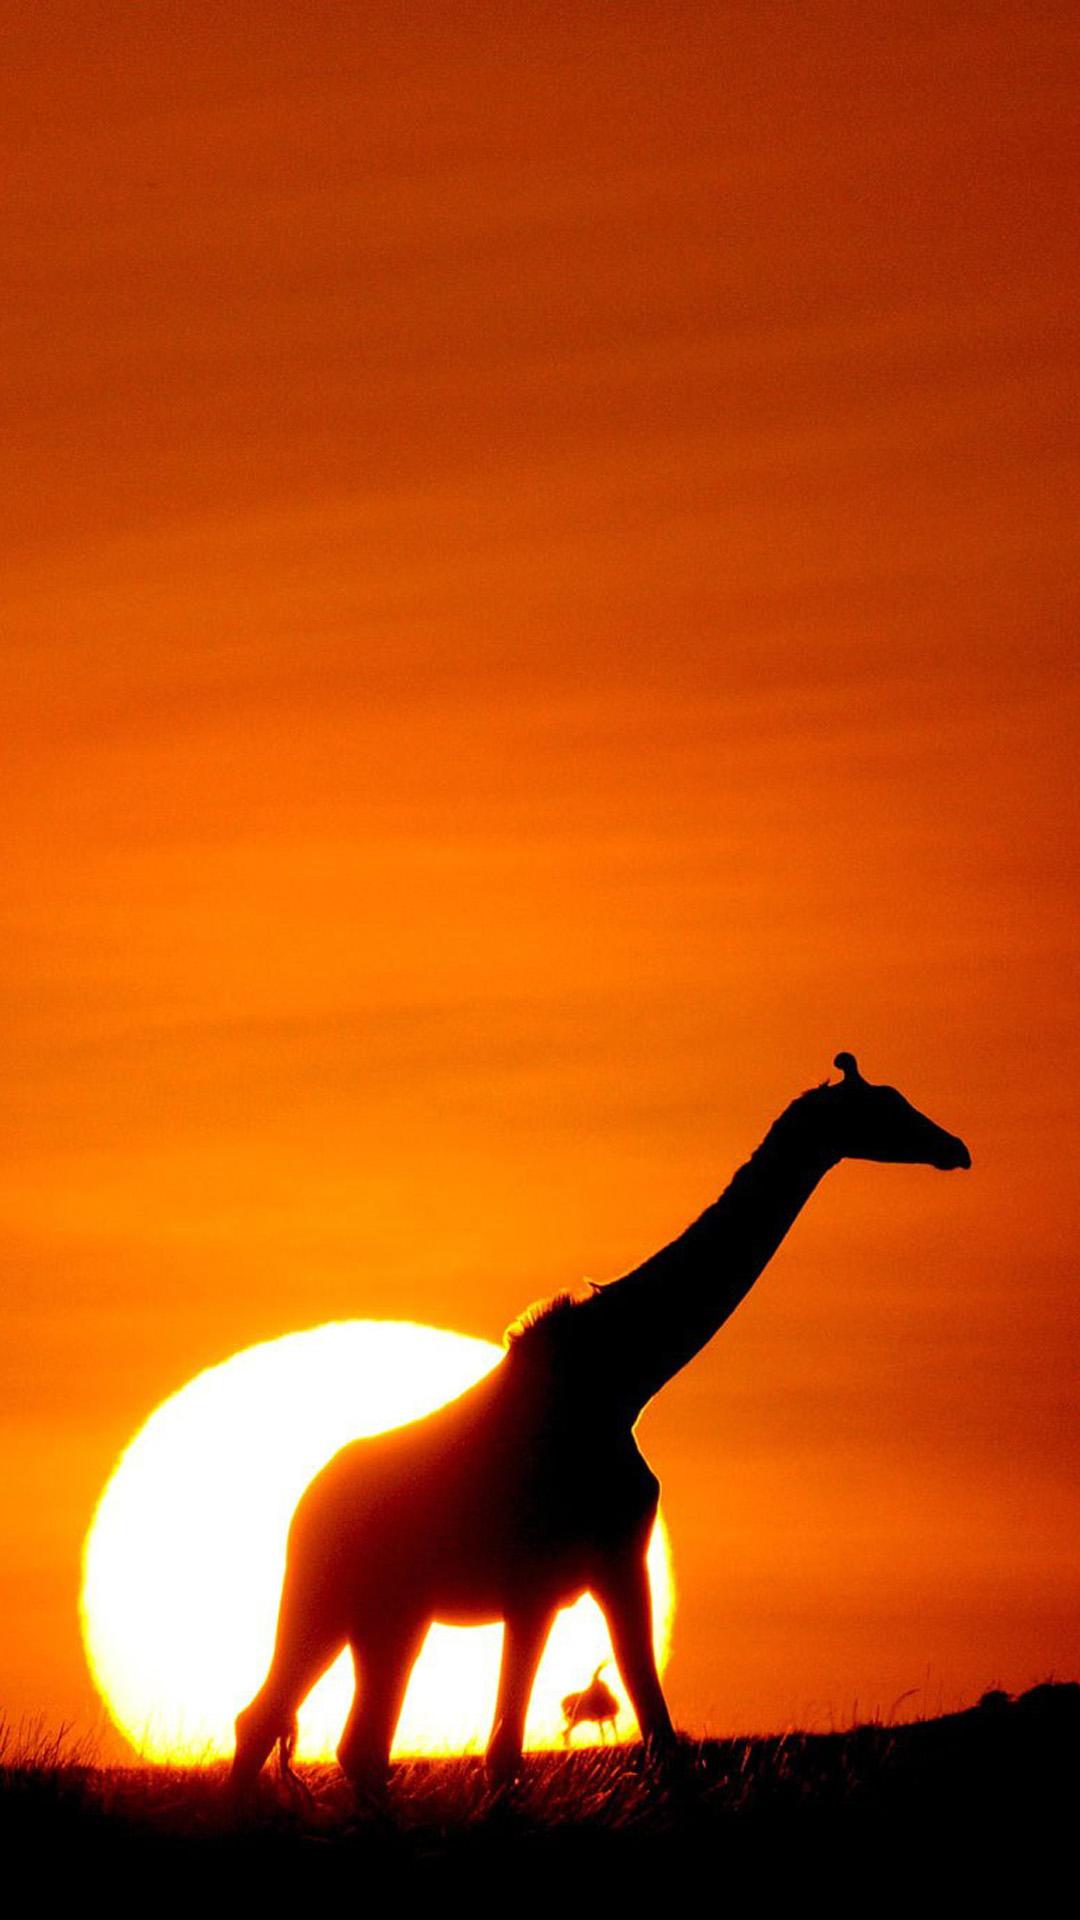 Download Wallpaper Colorful Giraffe - Sunset-Giraffe  Picture_771192 .jpg